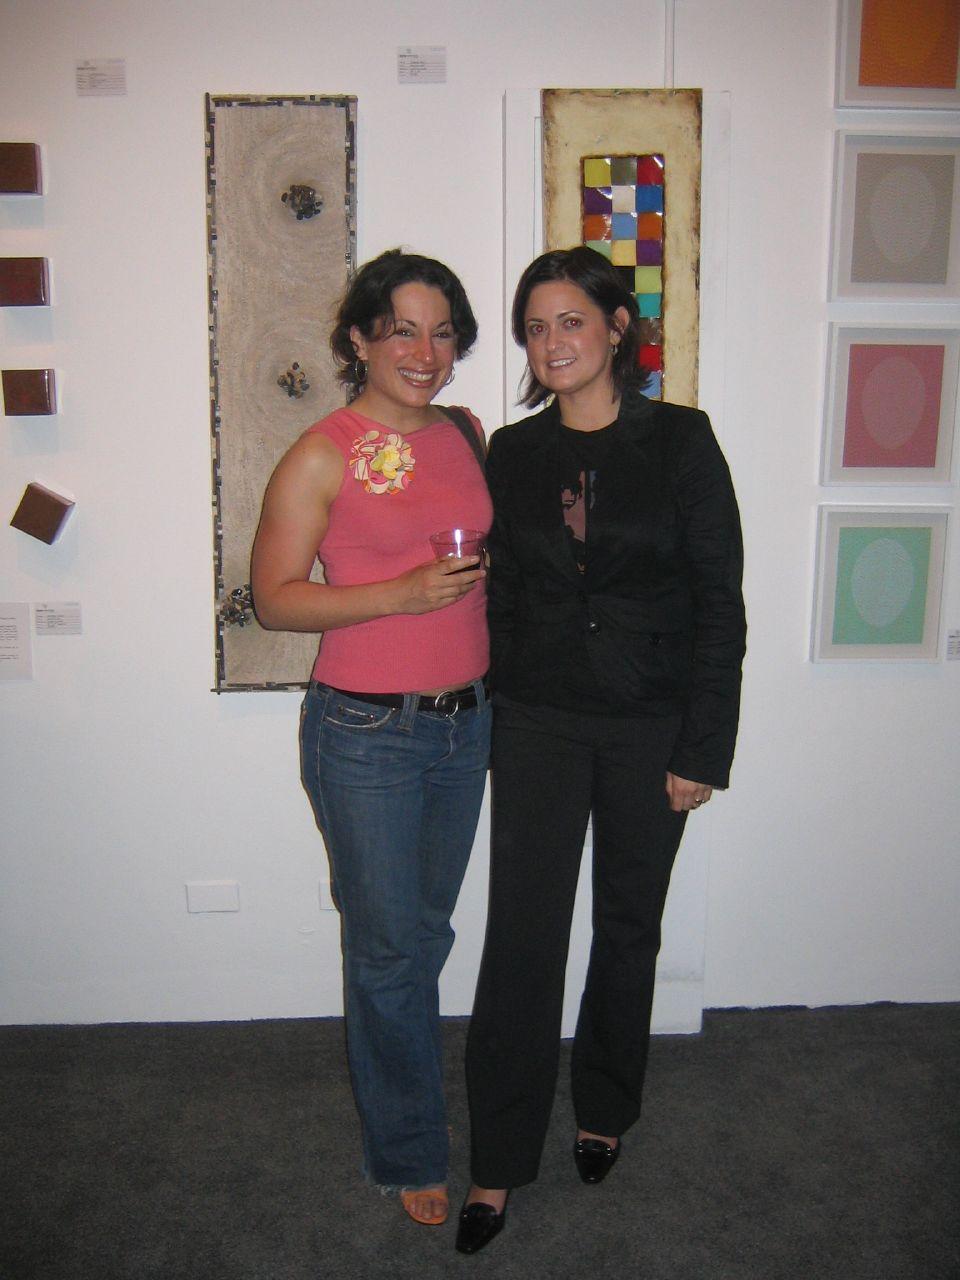 Artist Carla E. Reyes + Leche-Vitrines Gallery Director Danielle Lanteigne